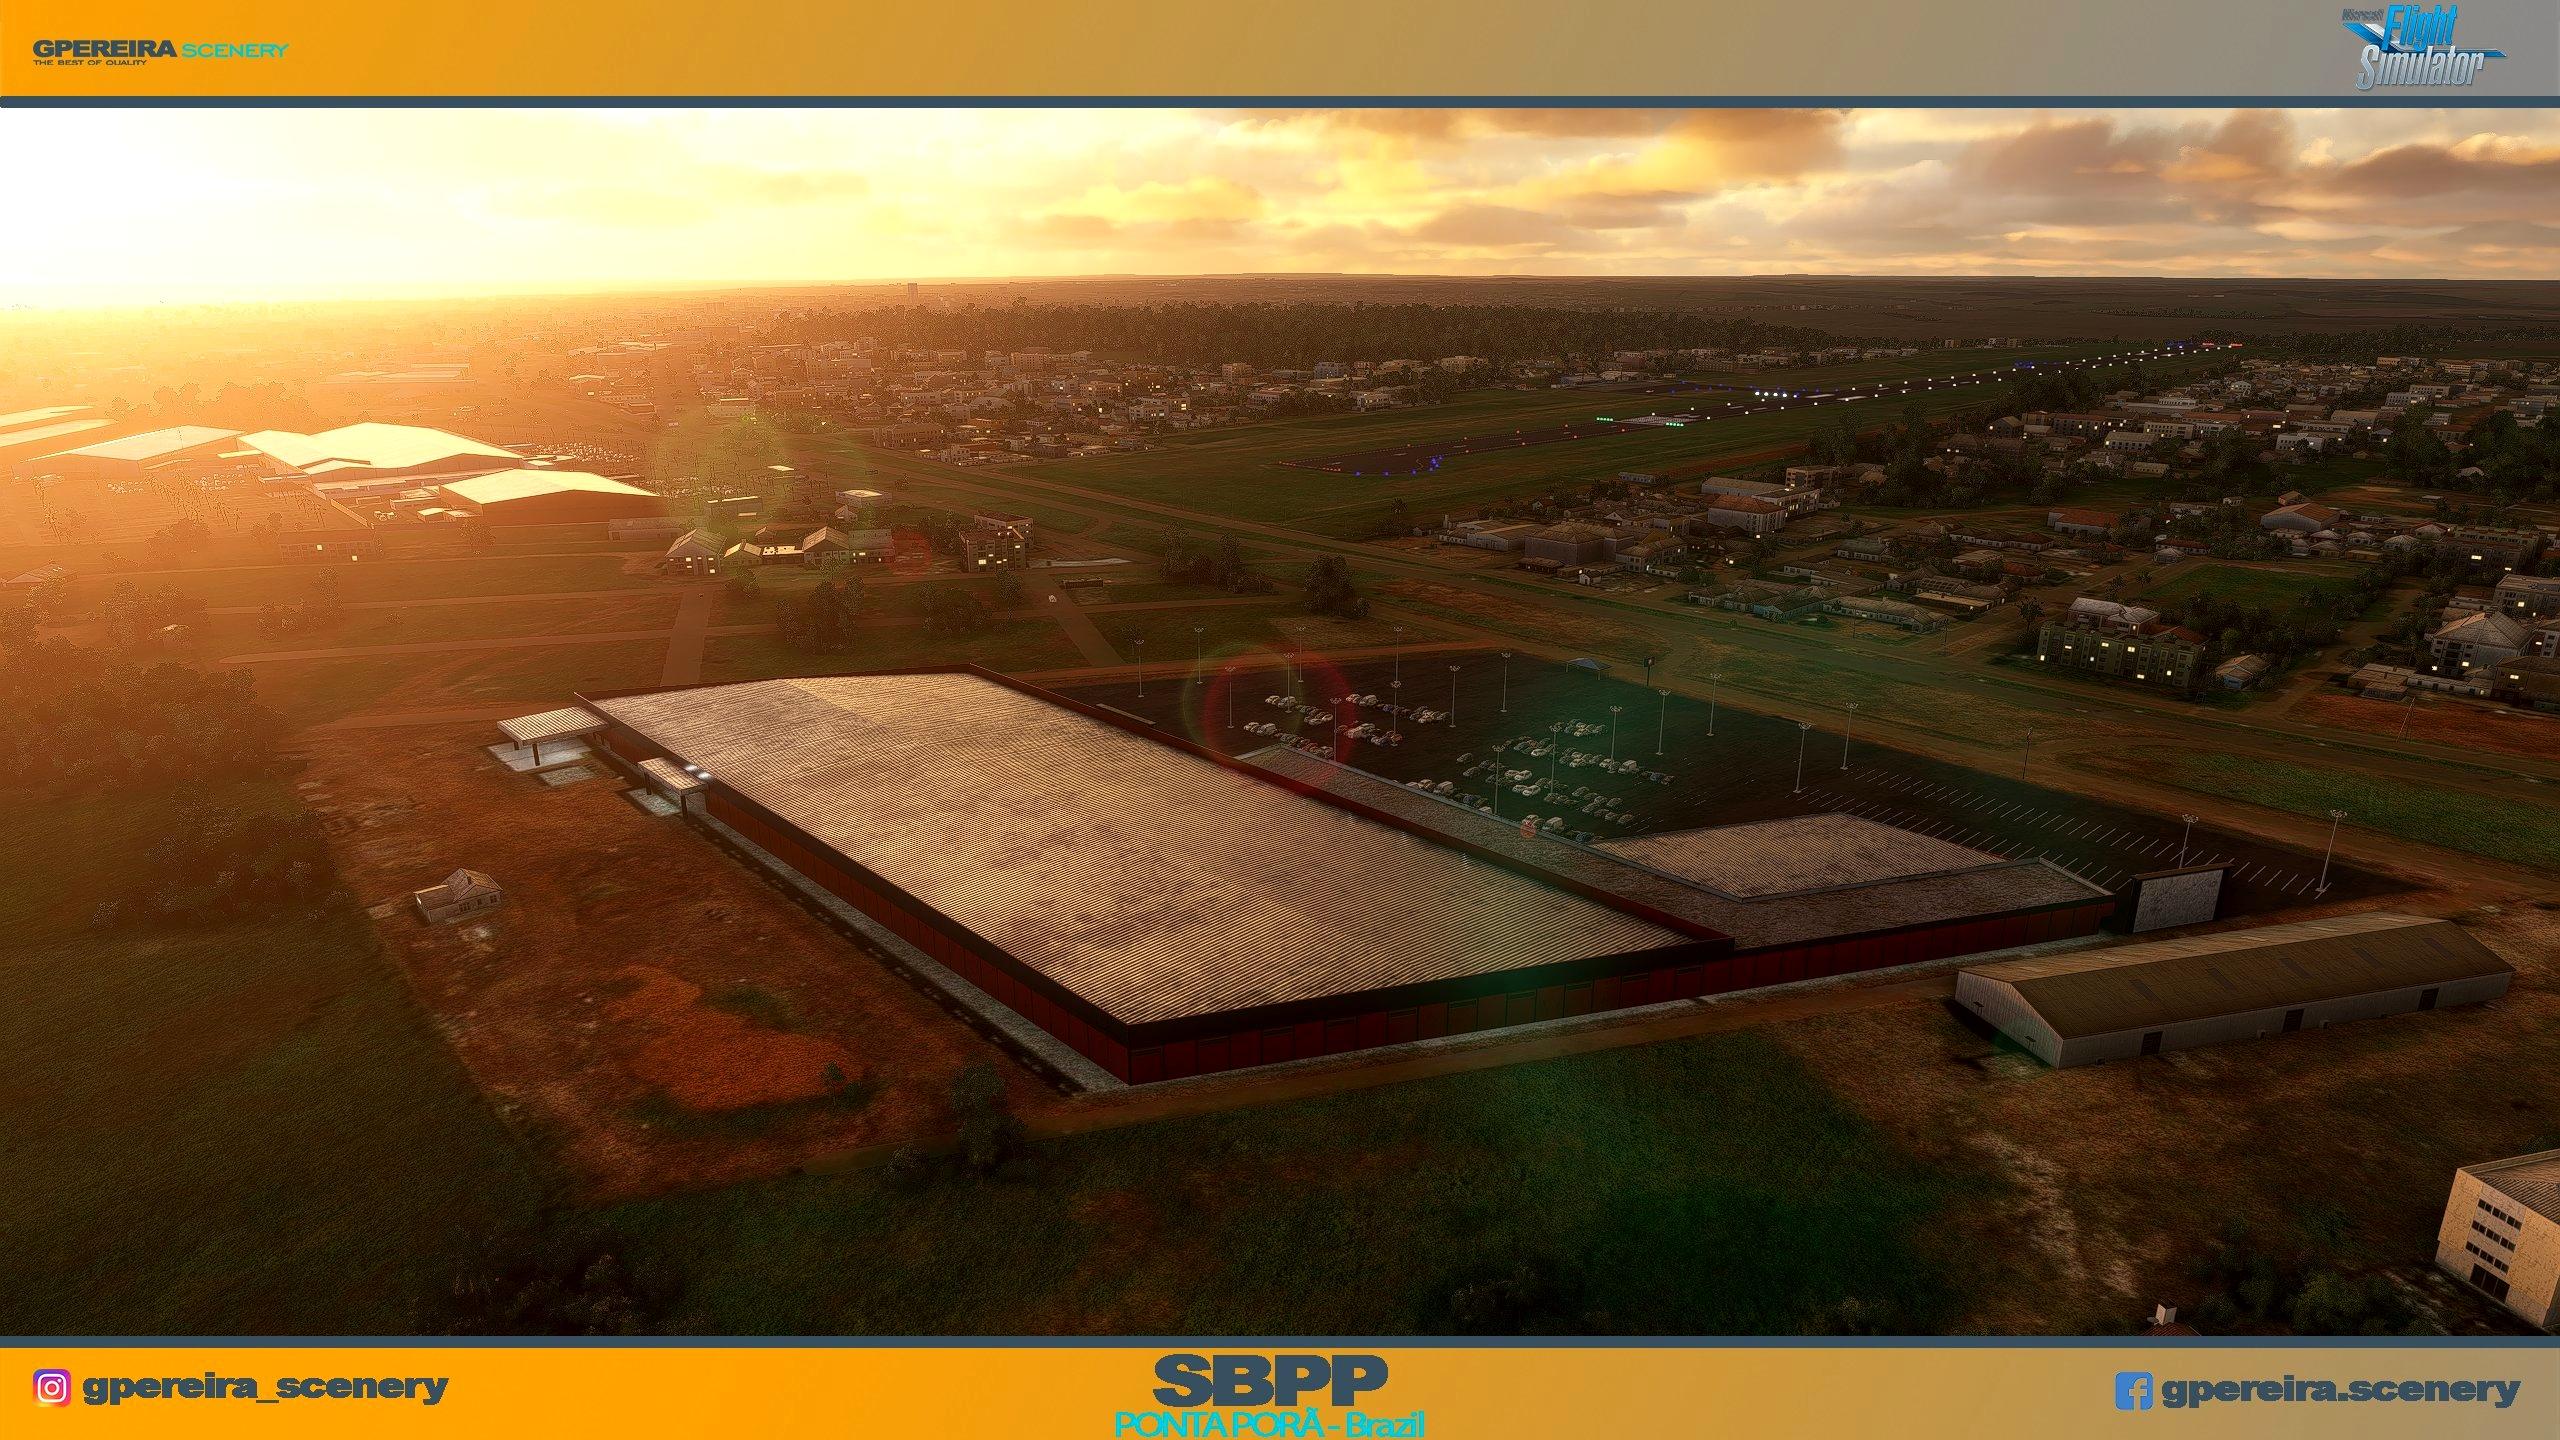 GPEREIRA SCENERY - PONTA PORÃ INTERNATIONAL - SBPP - BRAZIL MSFS